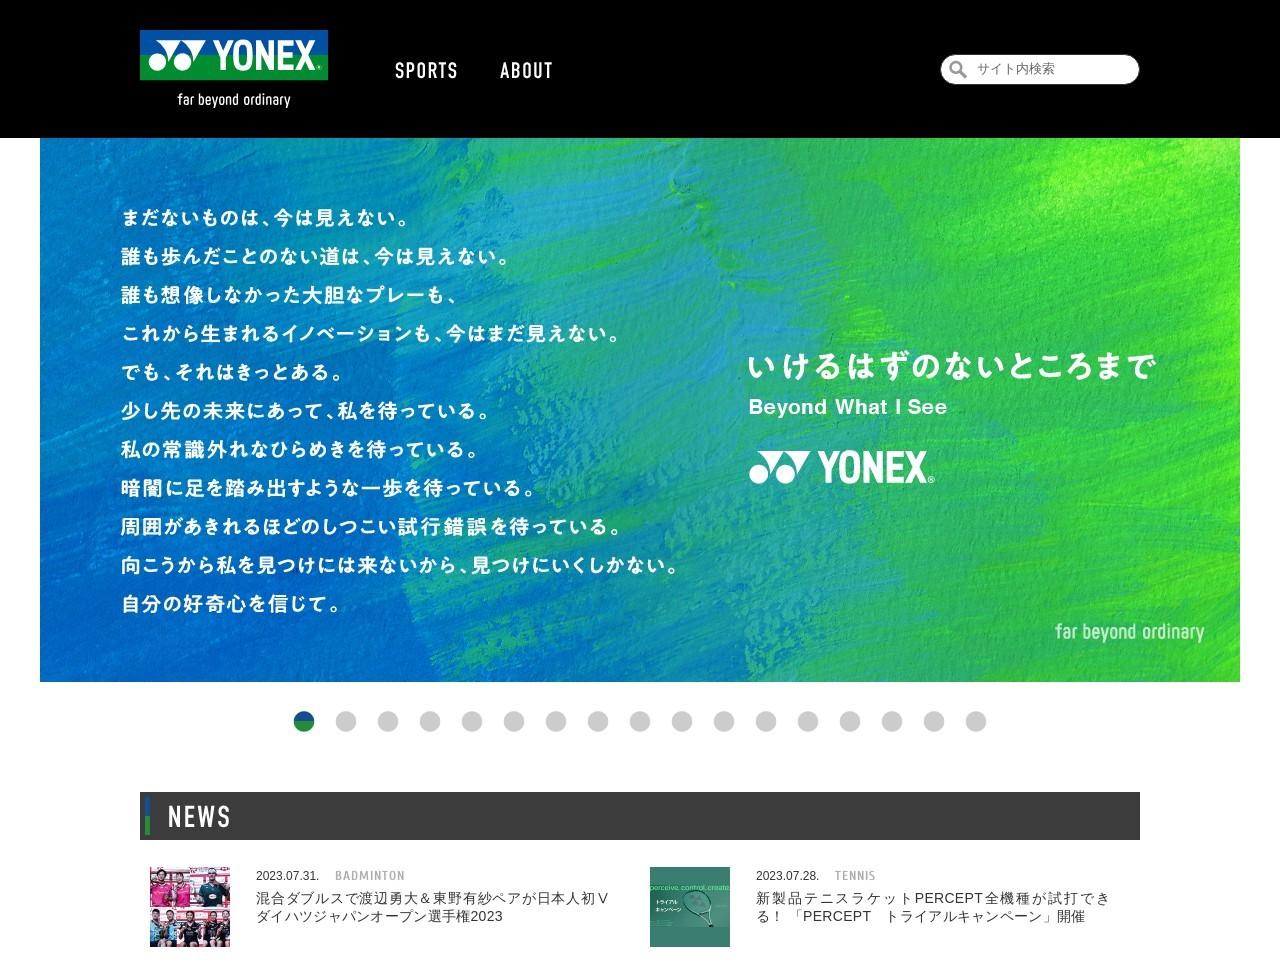 http://www.yonex.co.jp/news/2013/07/1307171700.html